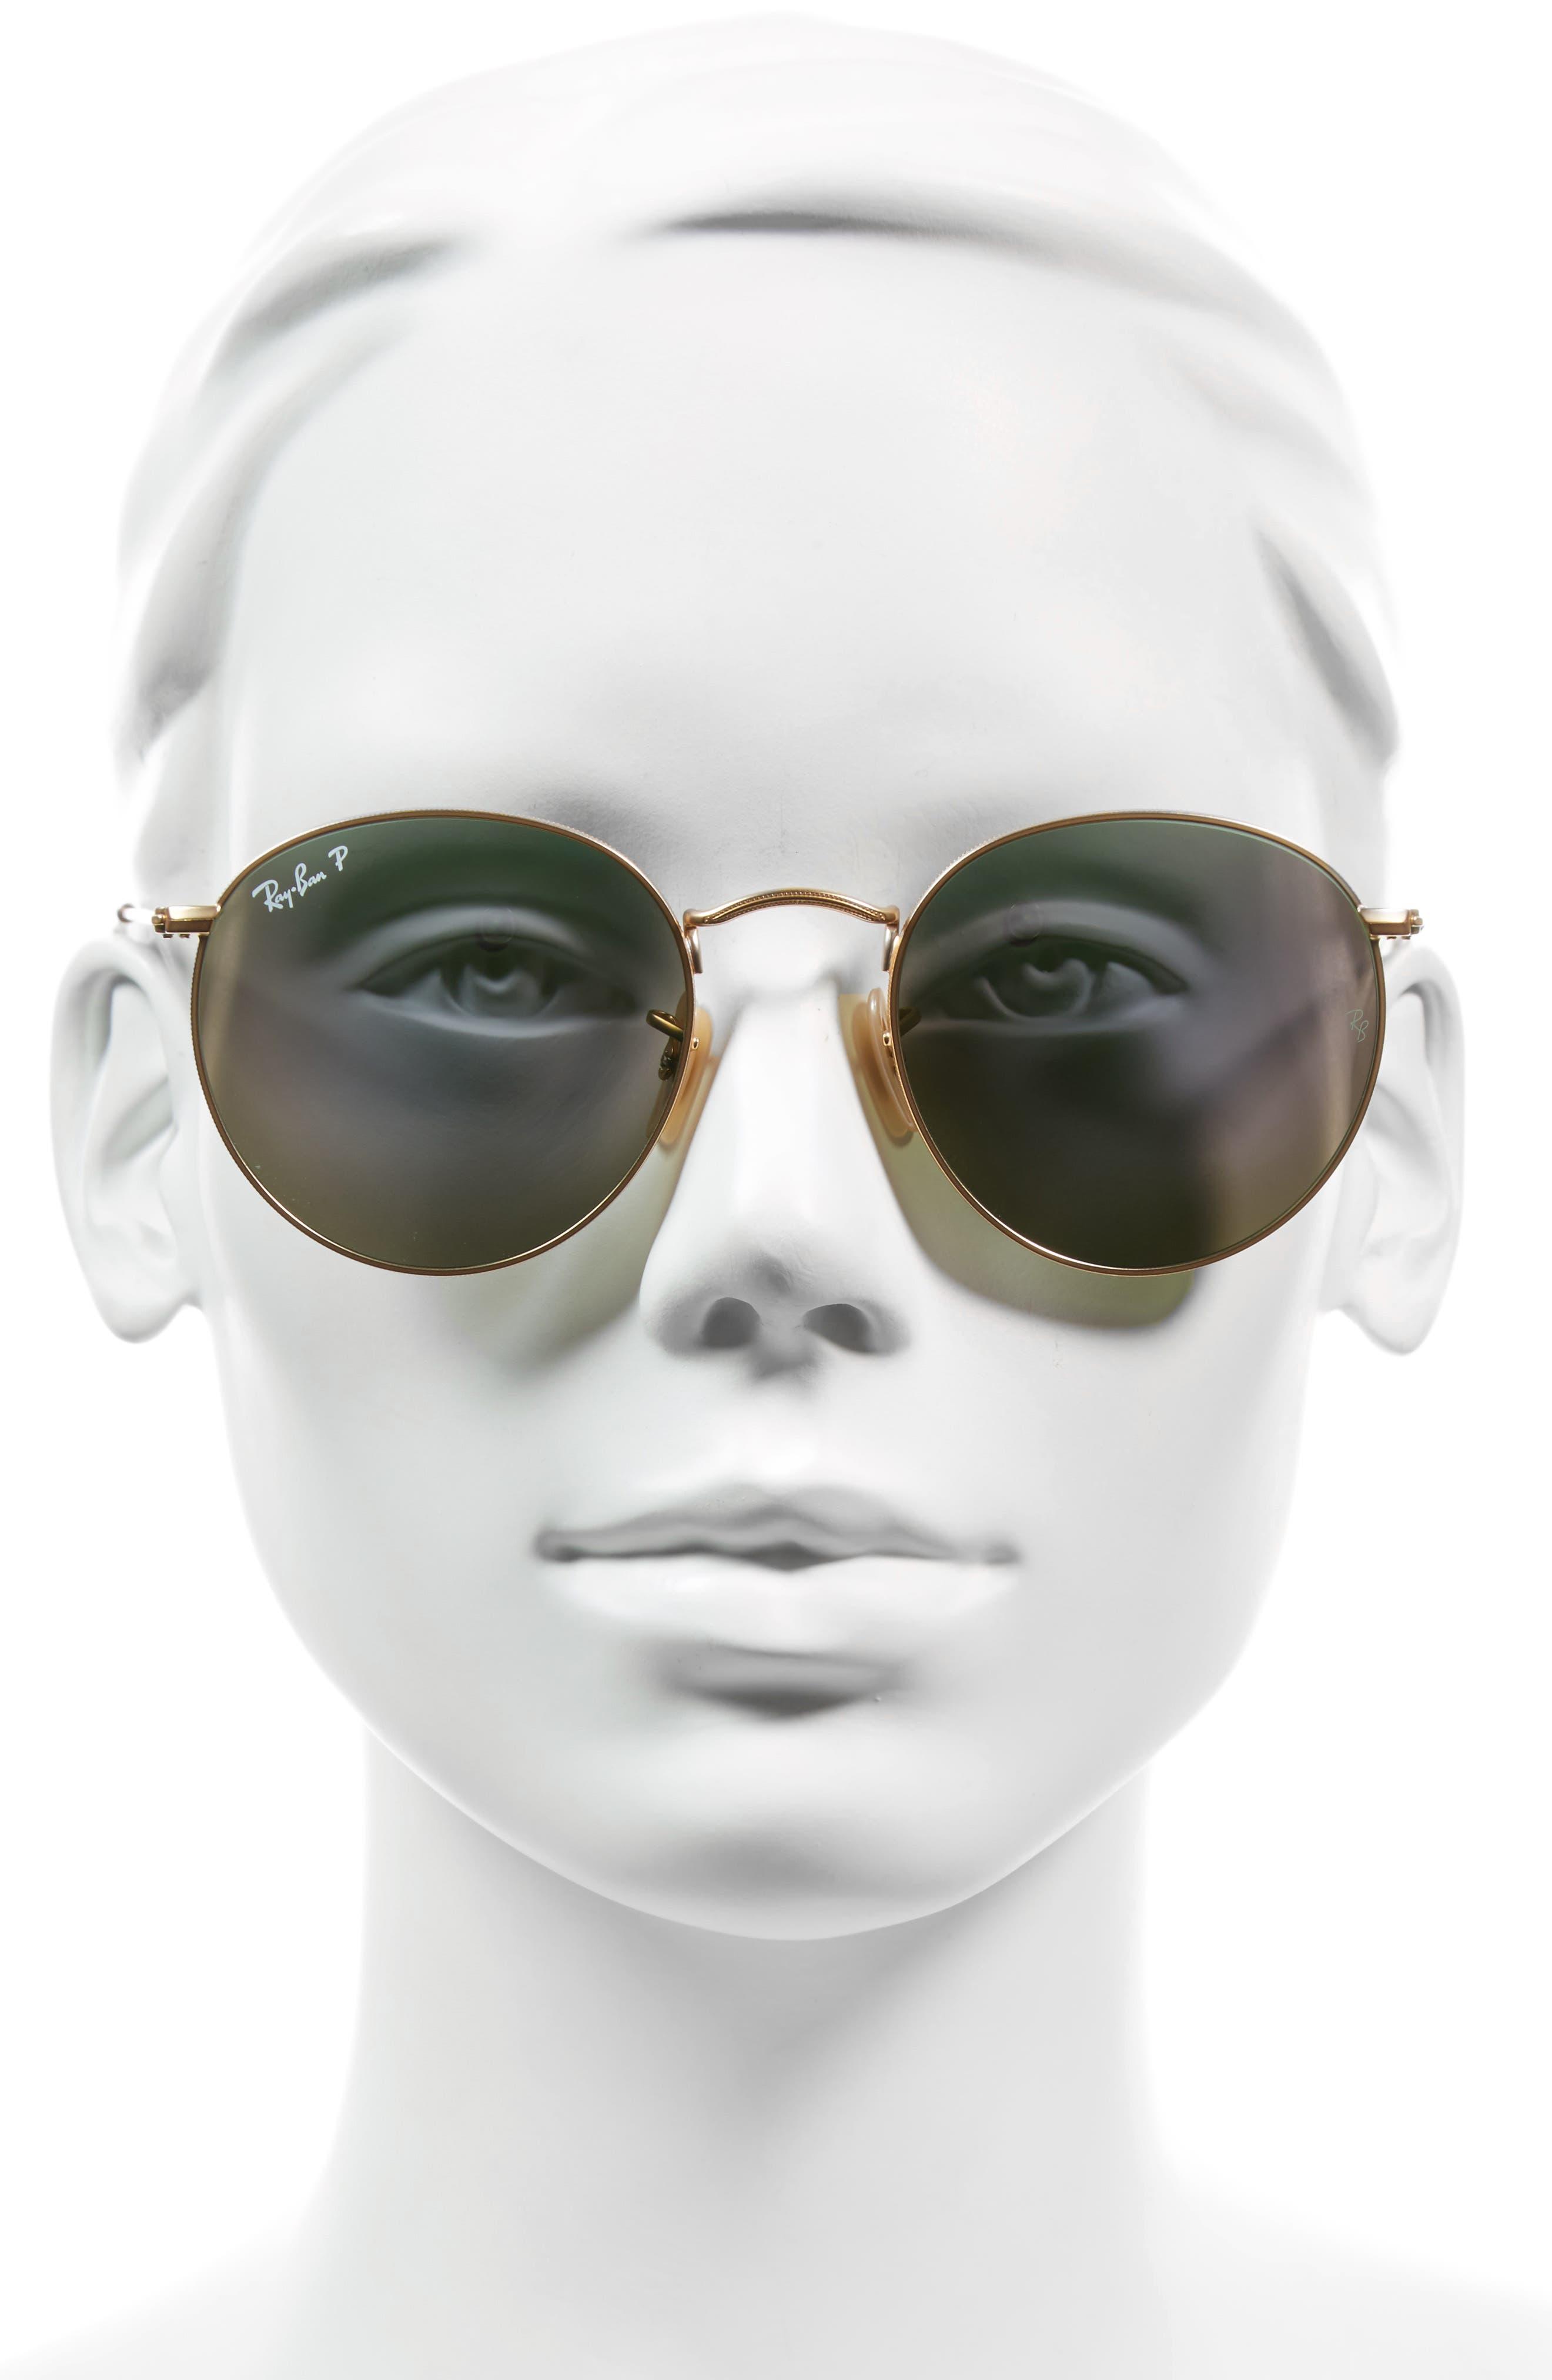 53mm Polarized Round Retro Sunglasses,                             Alternate thumbnail 2, color,                             300